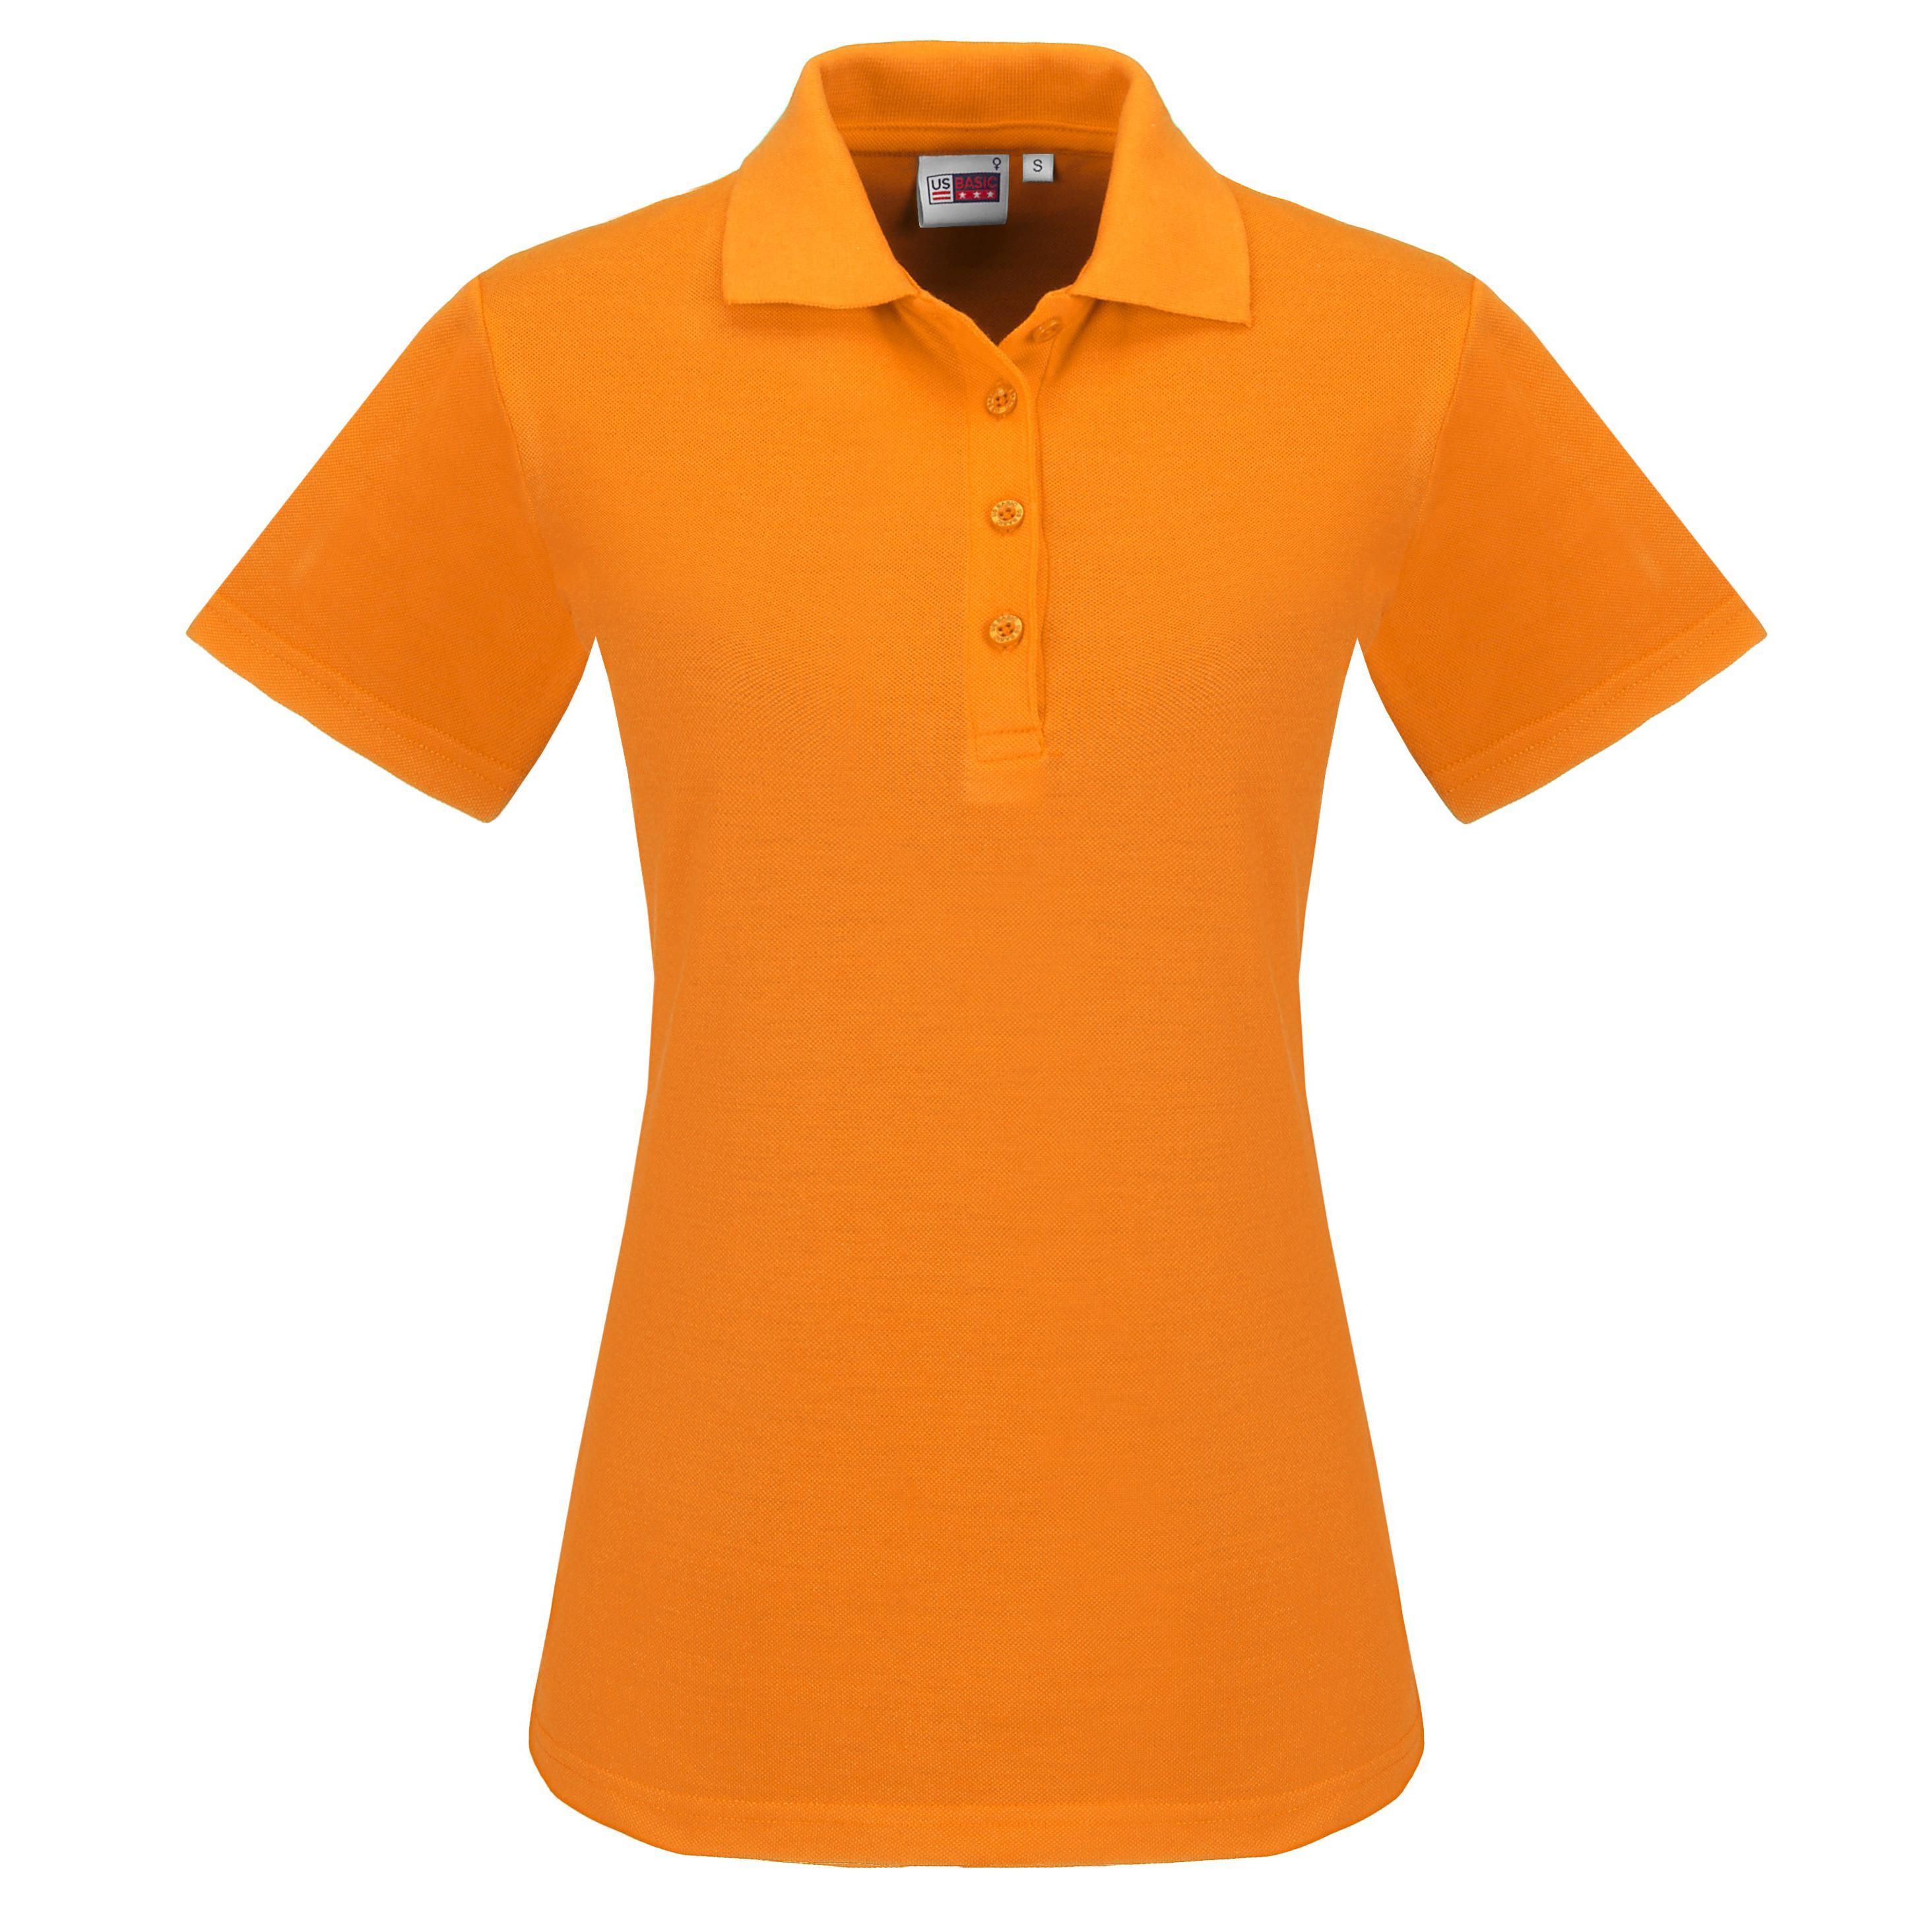 Ladies Elemental Golf Shirt - Orange Only